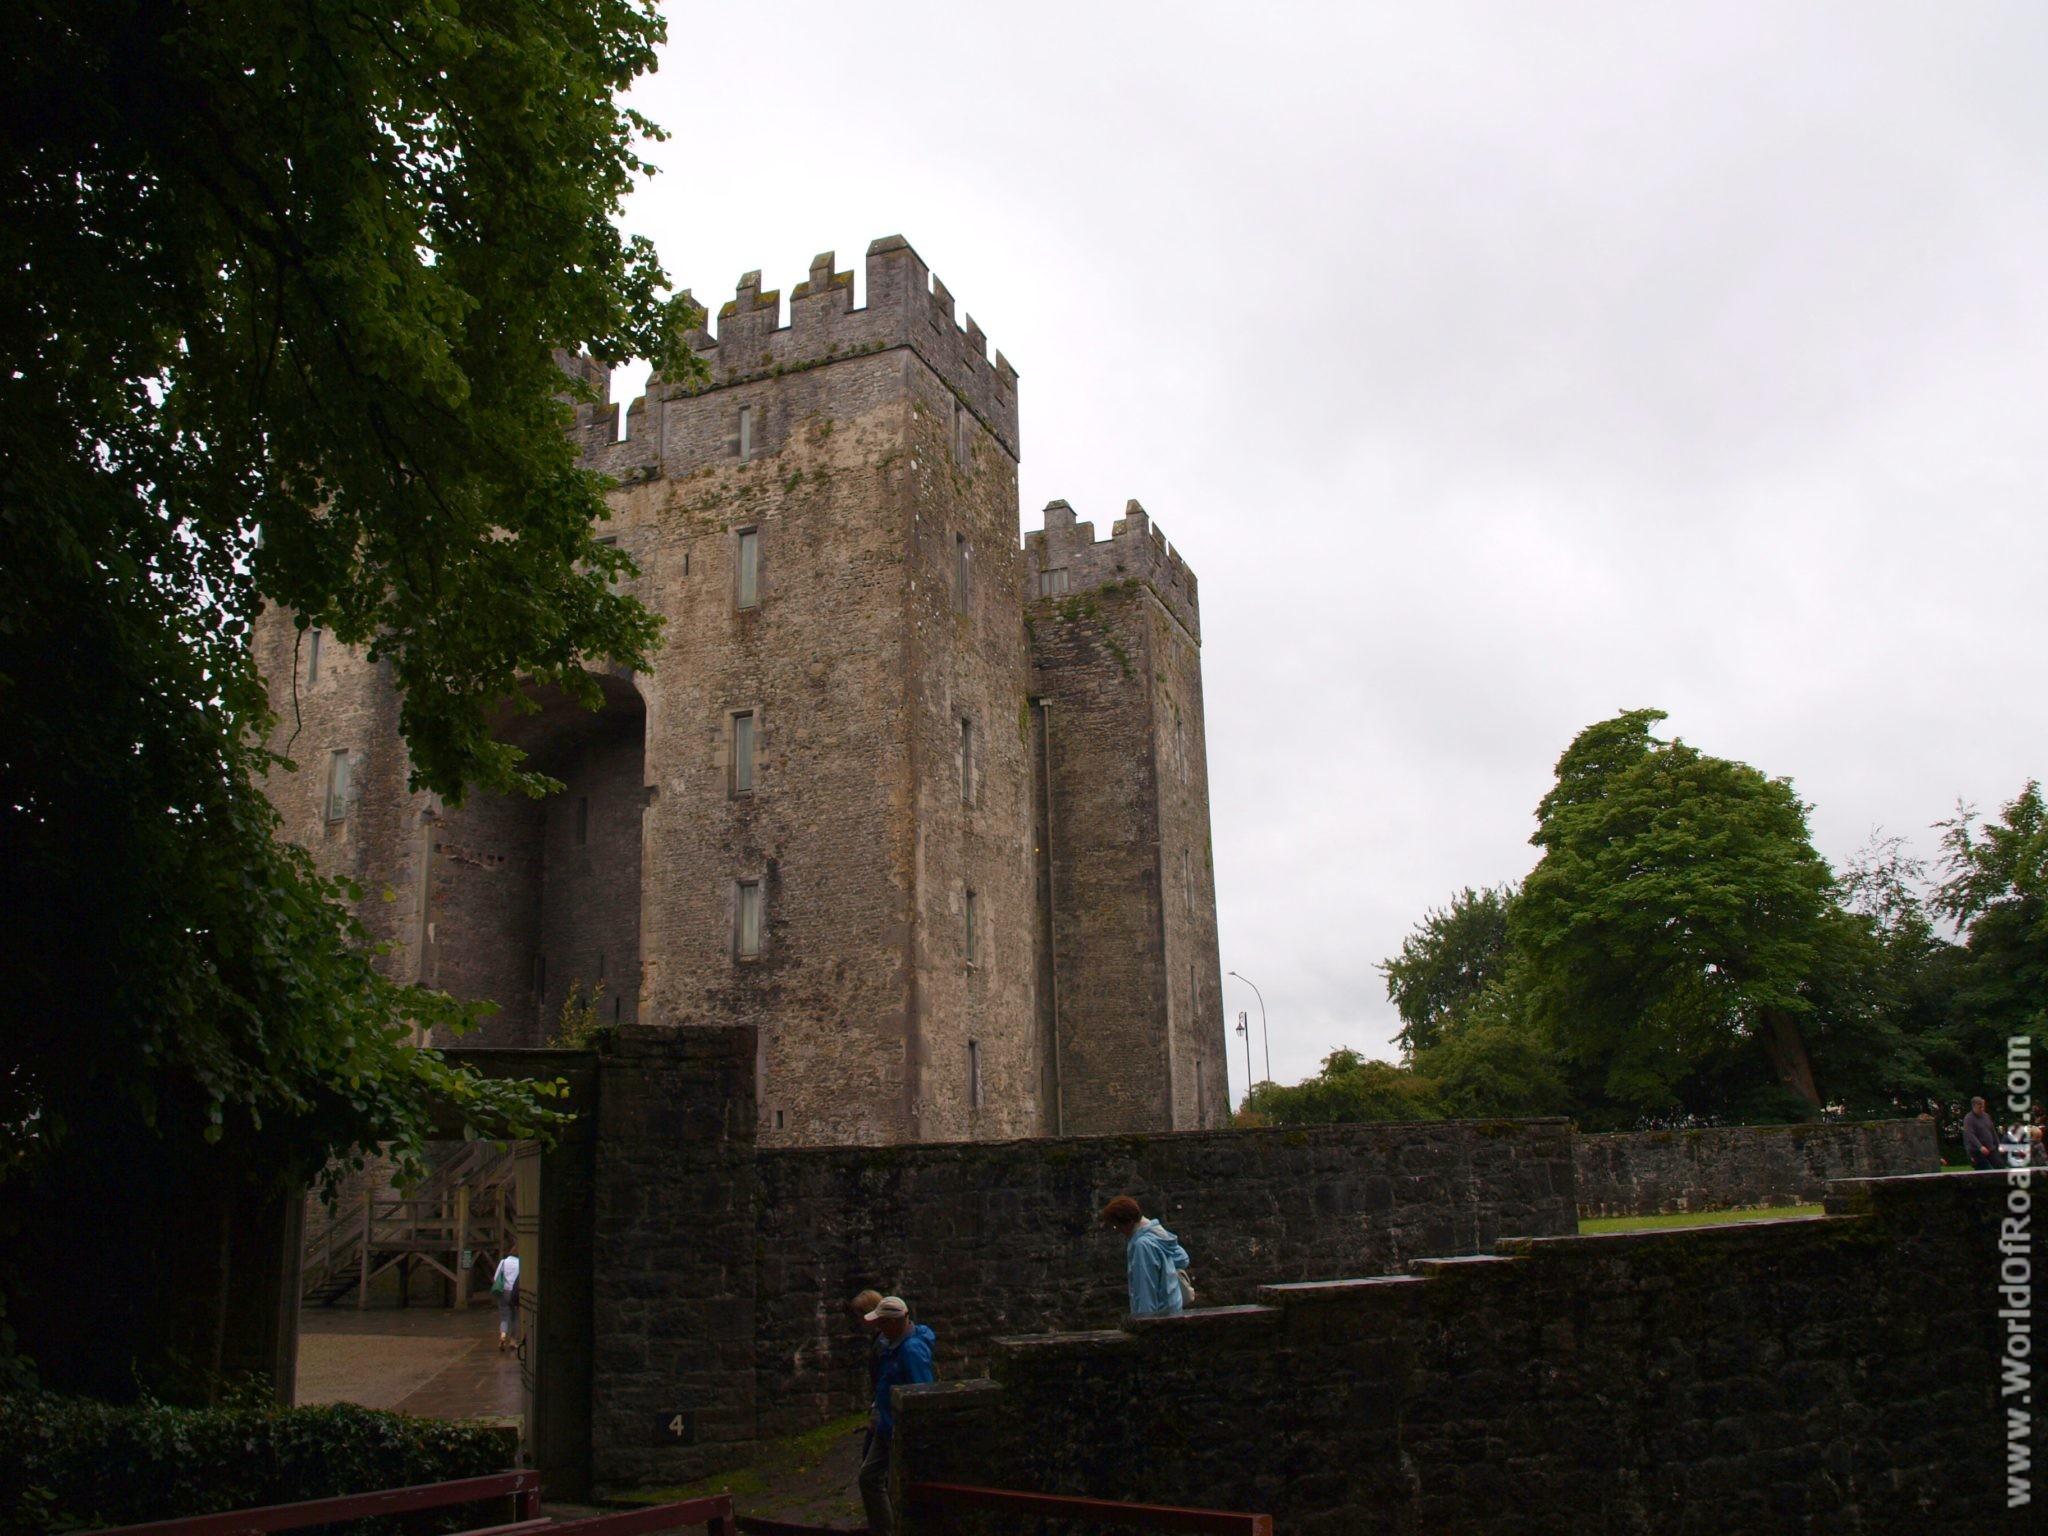 Замок Бунратти. Графство Клэр, Ирландия. (Bunratti Castle)